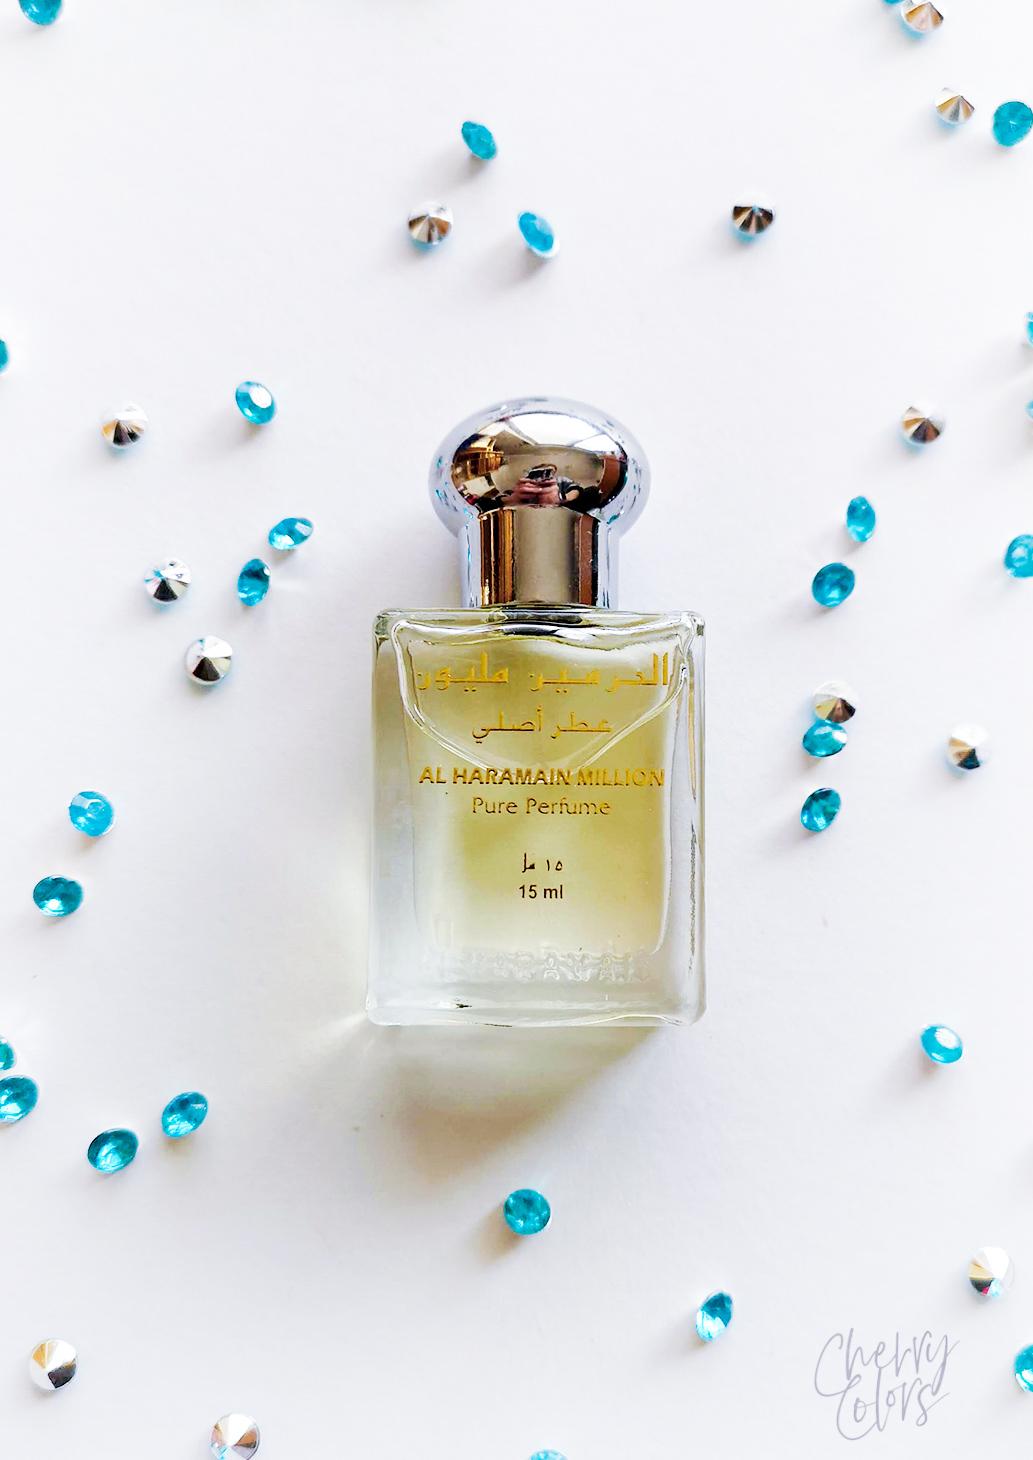 Al Haramain Million Perfume